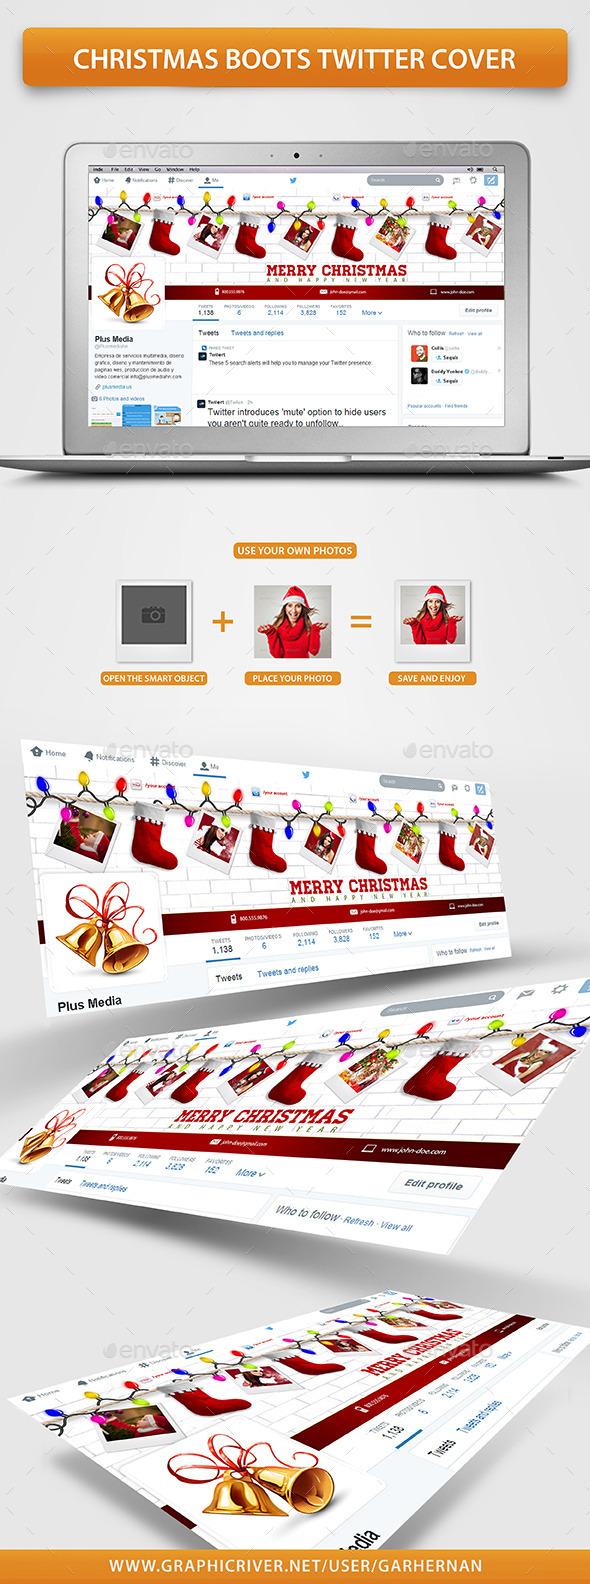 Christmas Boots Twitter Cover - Twitter Social Media